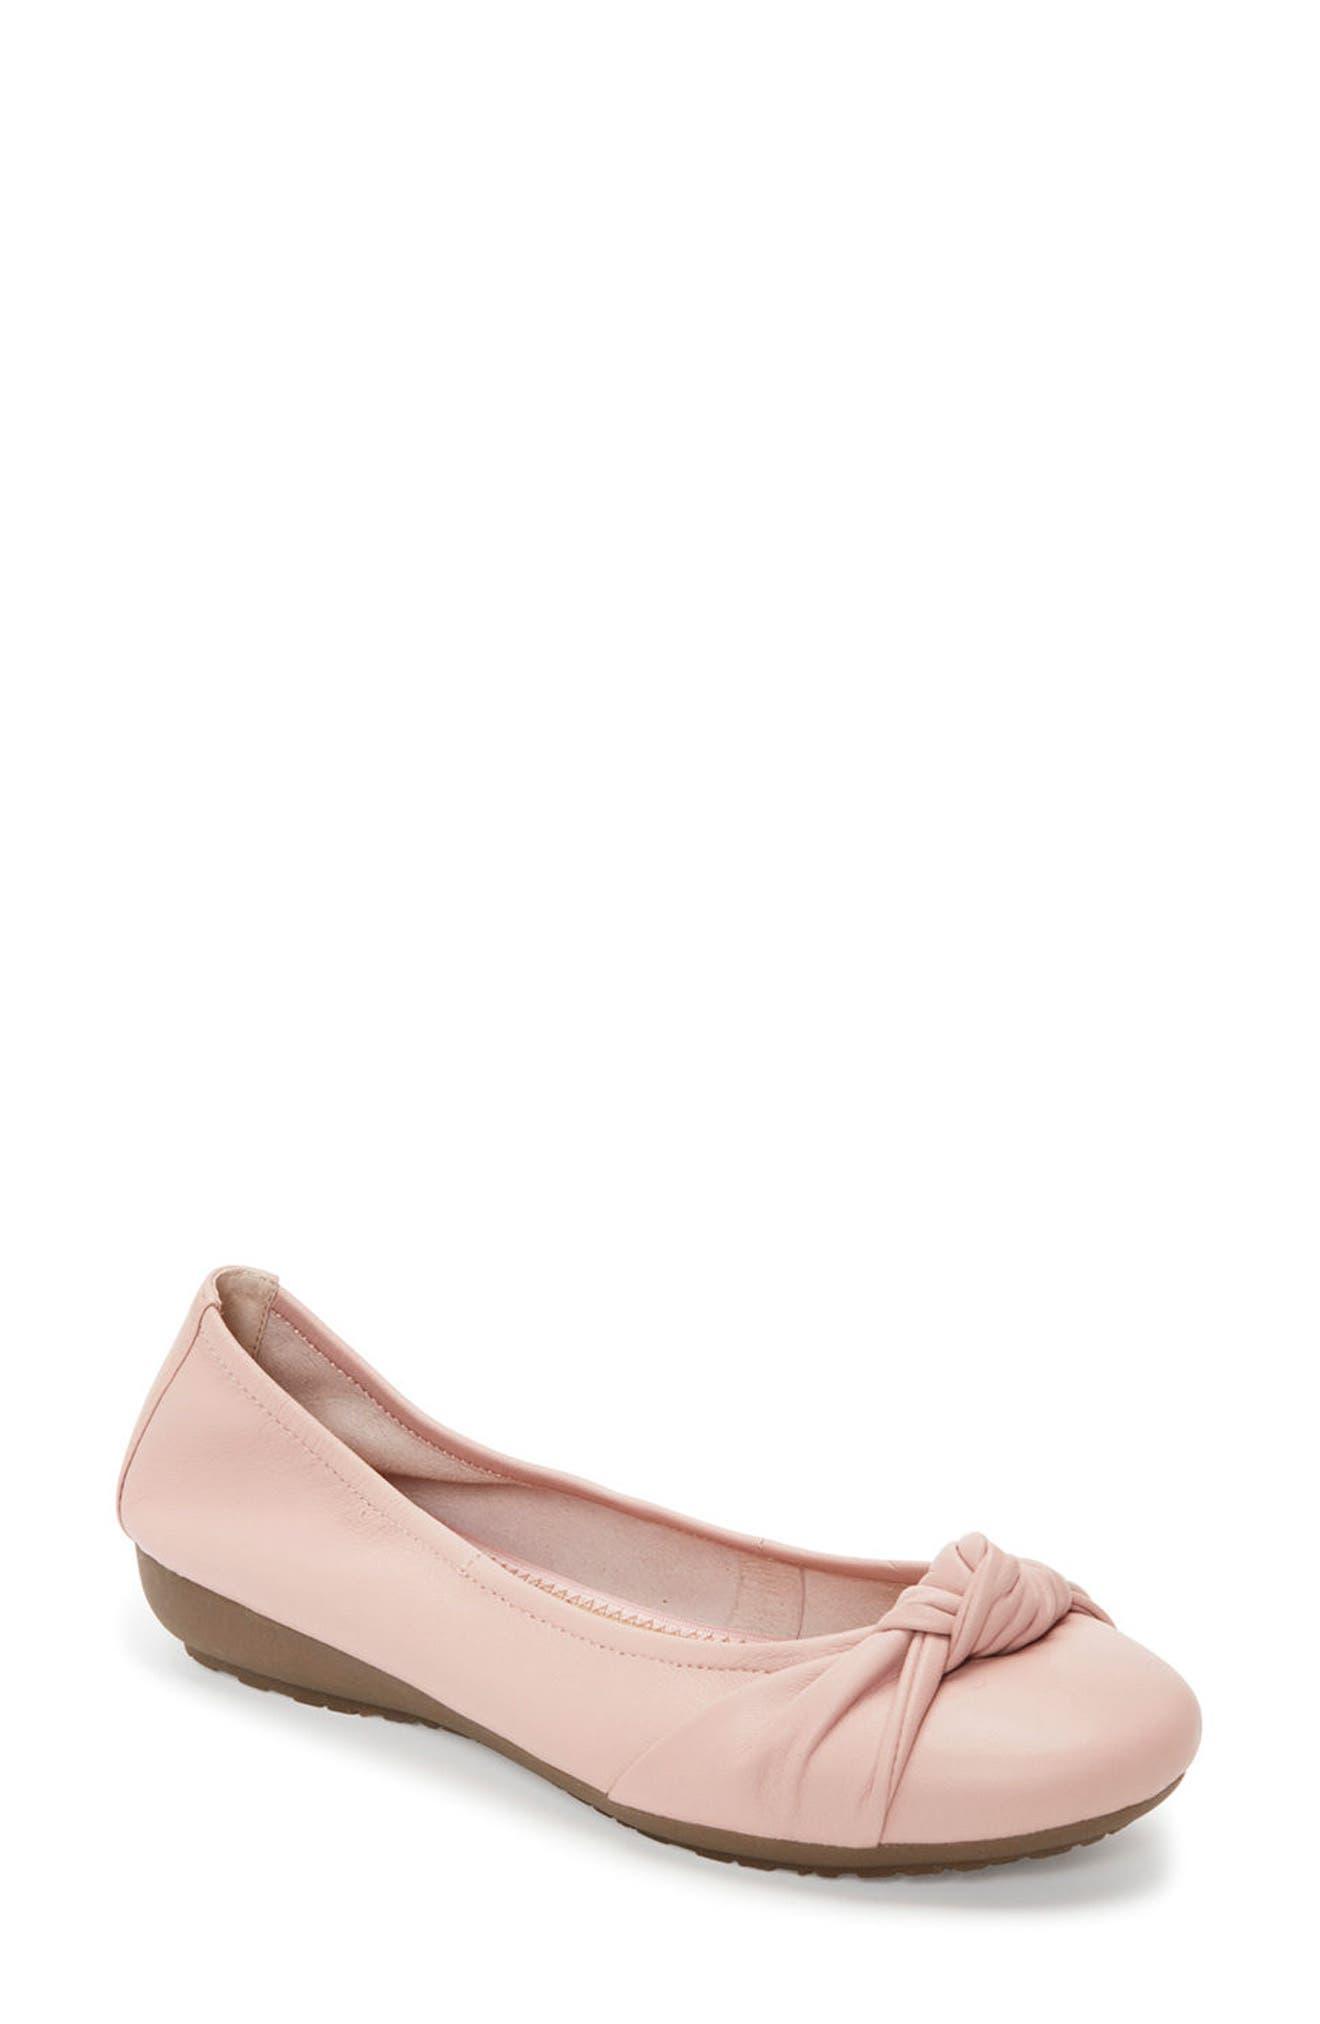 Jaci Flat,                             Main thumbnail 1, color,                             Pink Leather